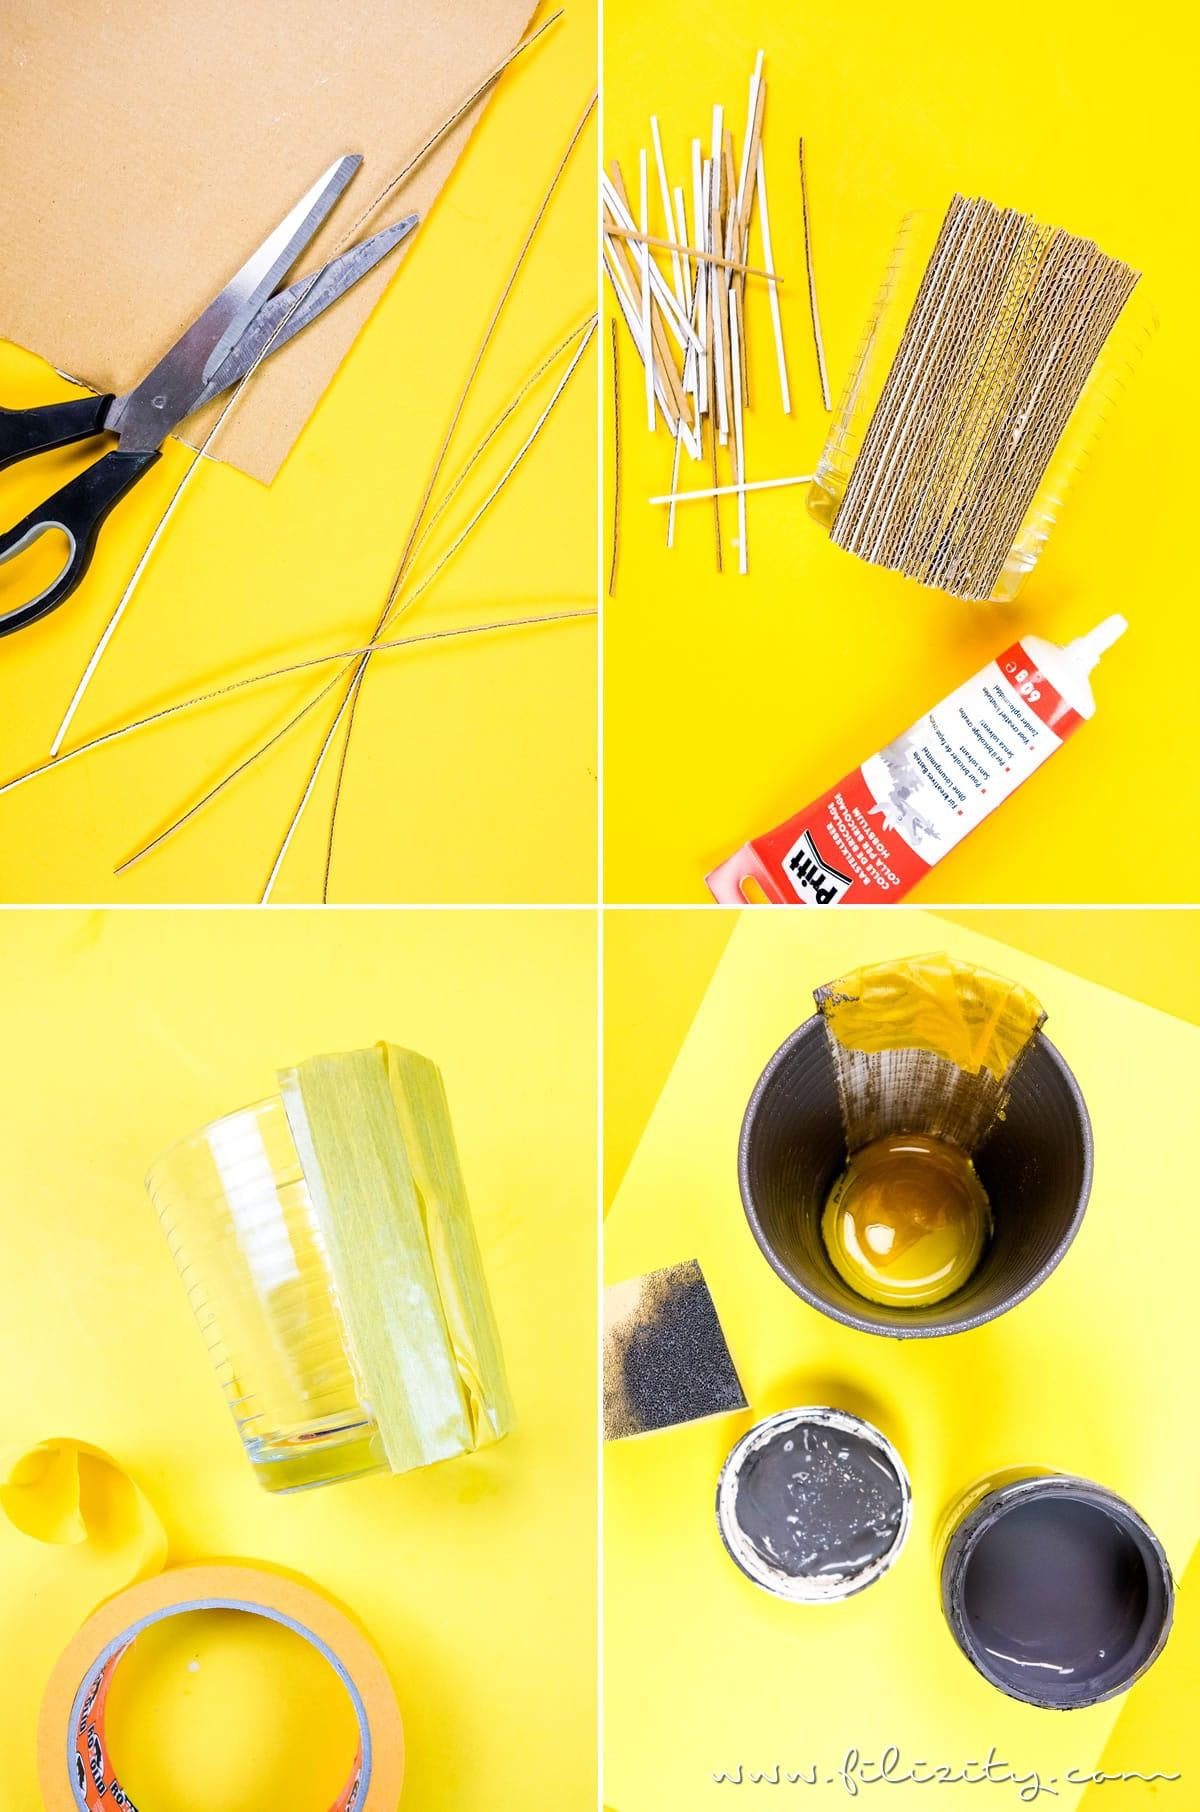 Upcycling: DIY Windlicht aus Pappkarton basteln - 5 Blogs 1000 Ideen | Filizity.com - DIY Blog aus Rheinland #herbst #upcycling #5Blogs1000Ideen